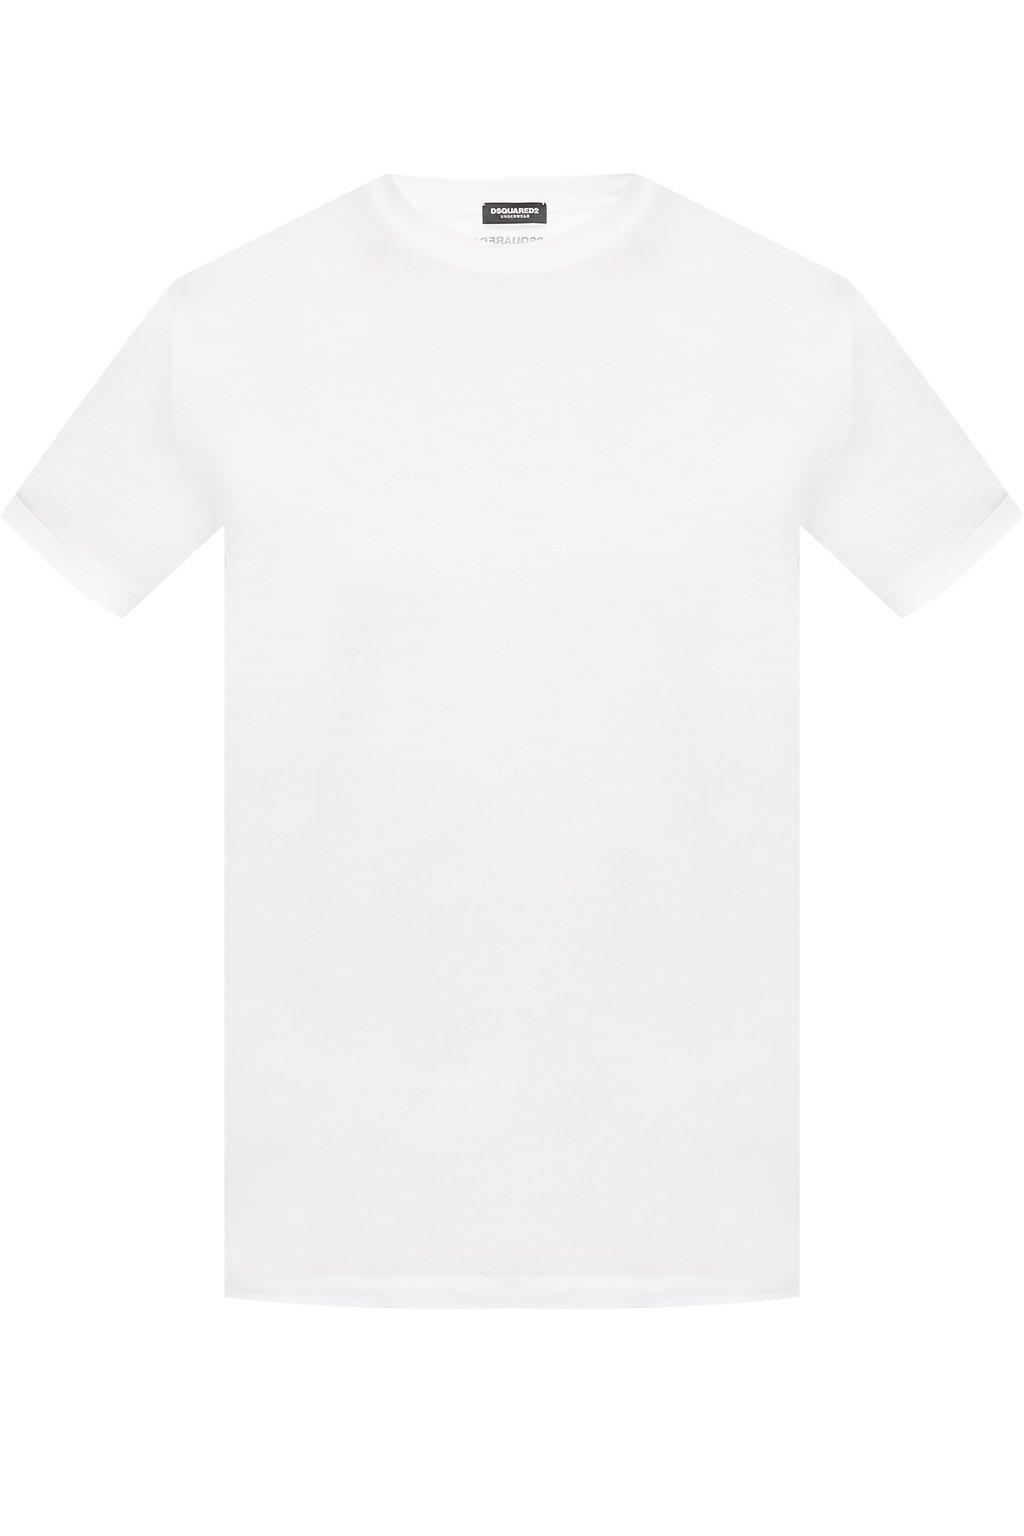 dsquared2 round neck t-shirt white